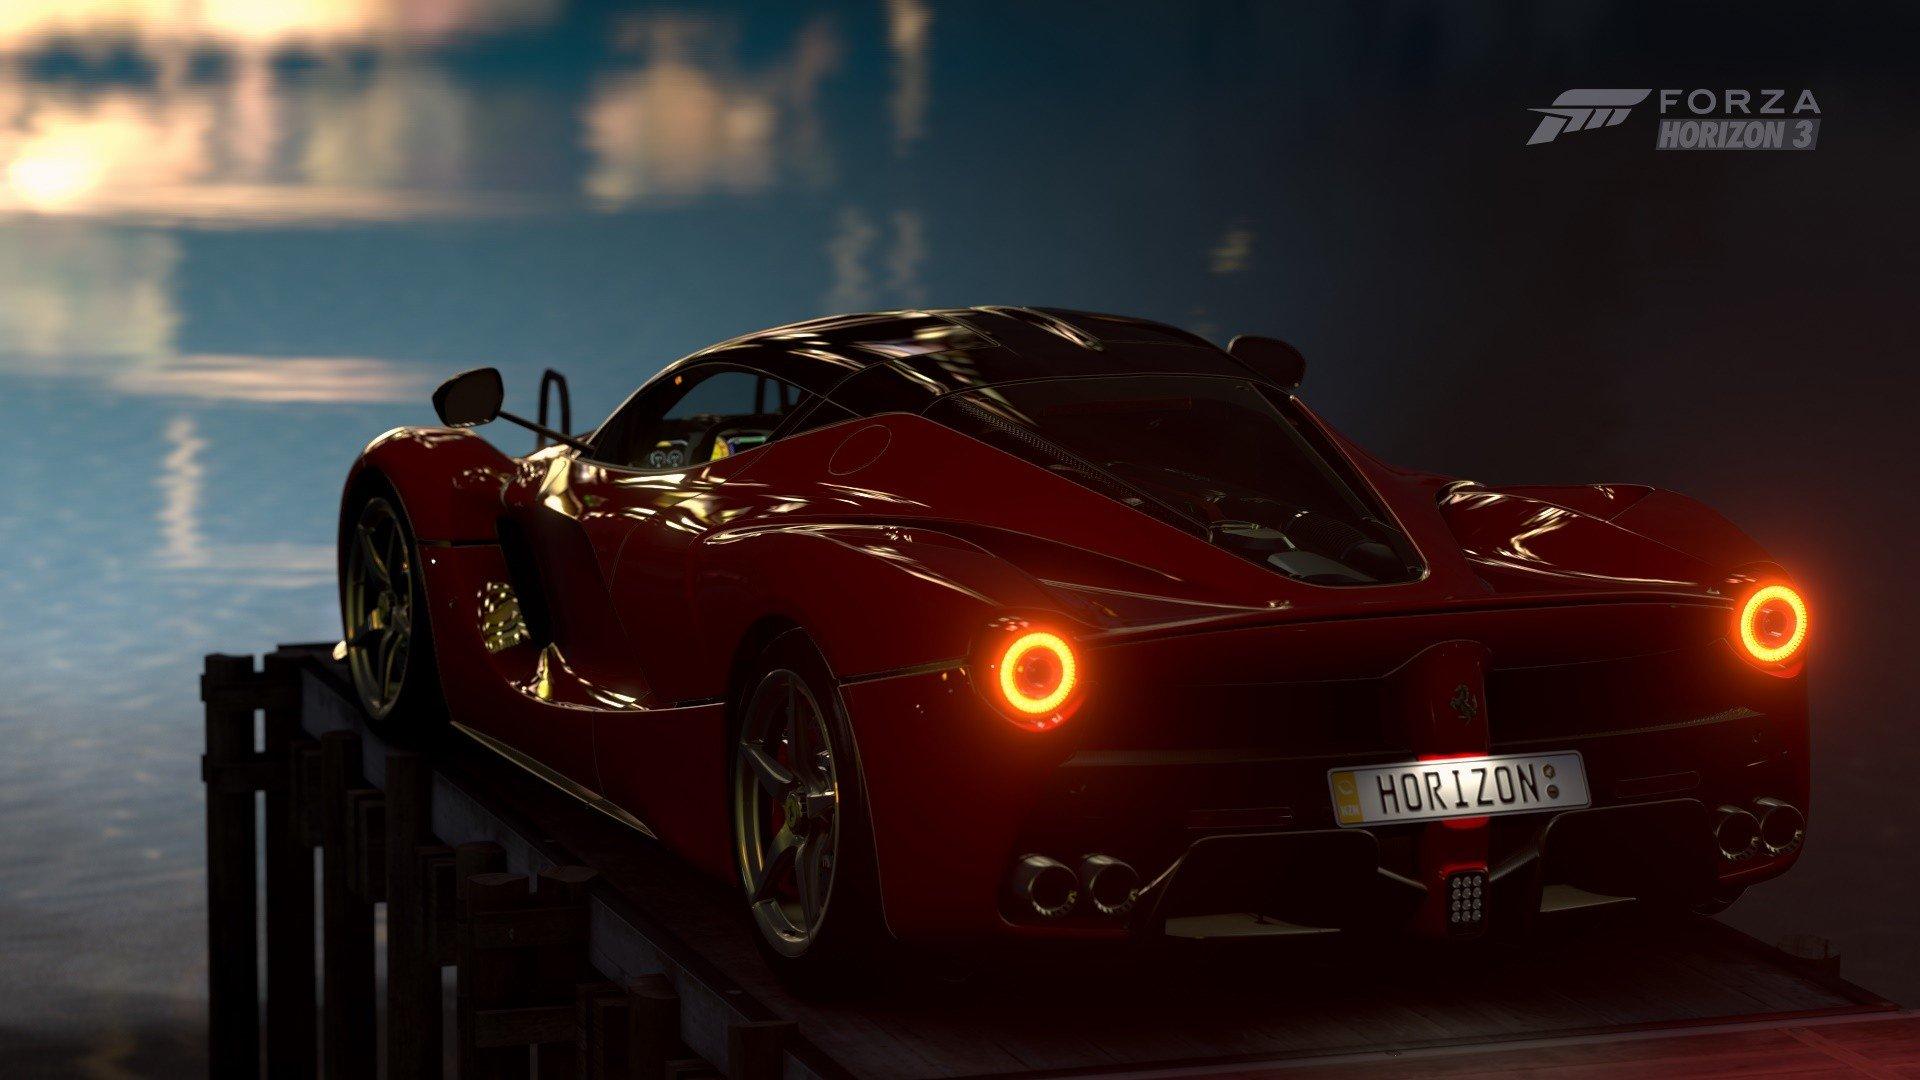 Lamborghini Car Hd Wallpaper For Pc Forza Horizon 3 Video Games Ferrari Hd Wallpapers